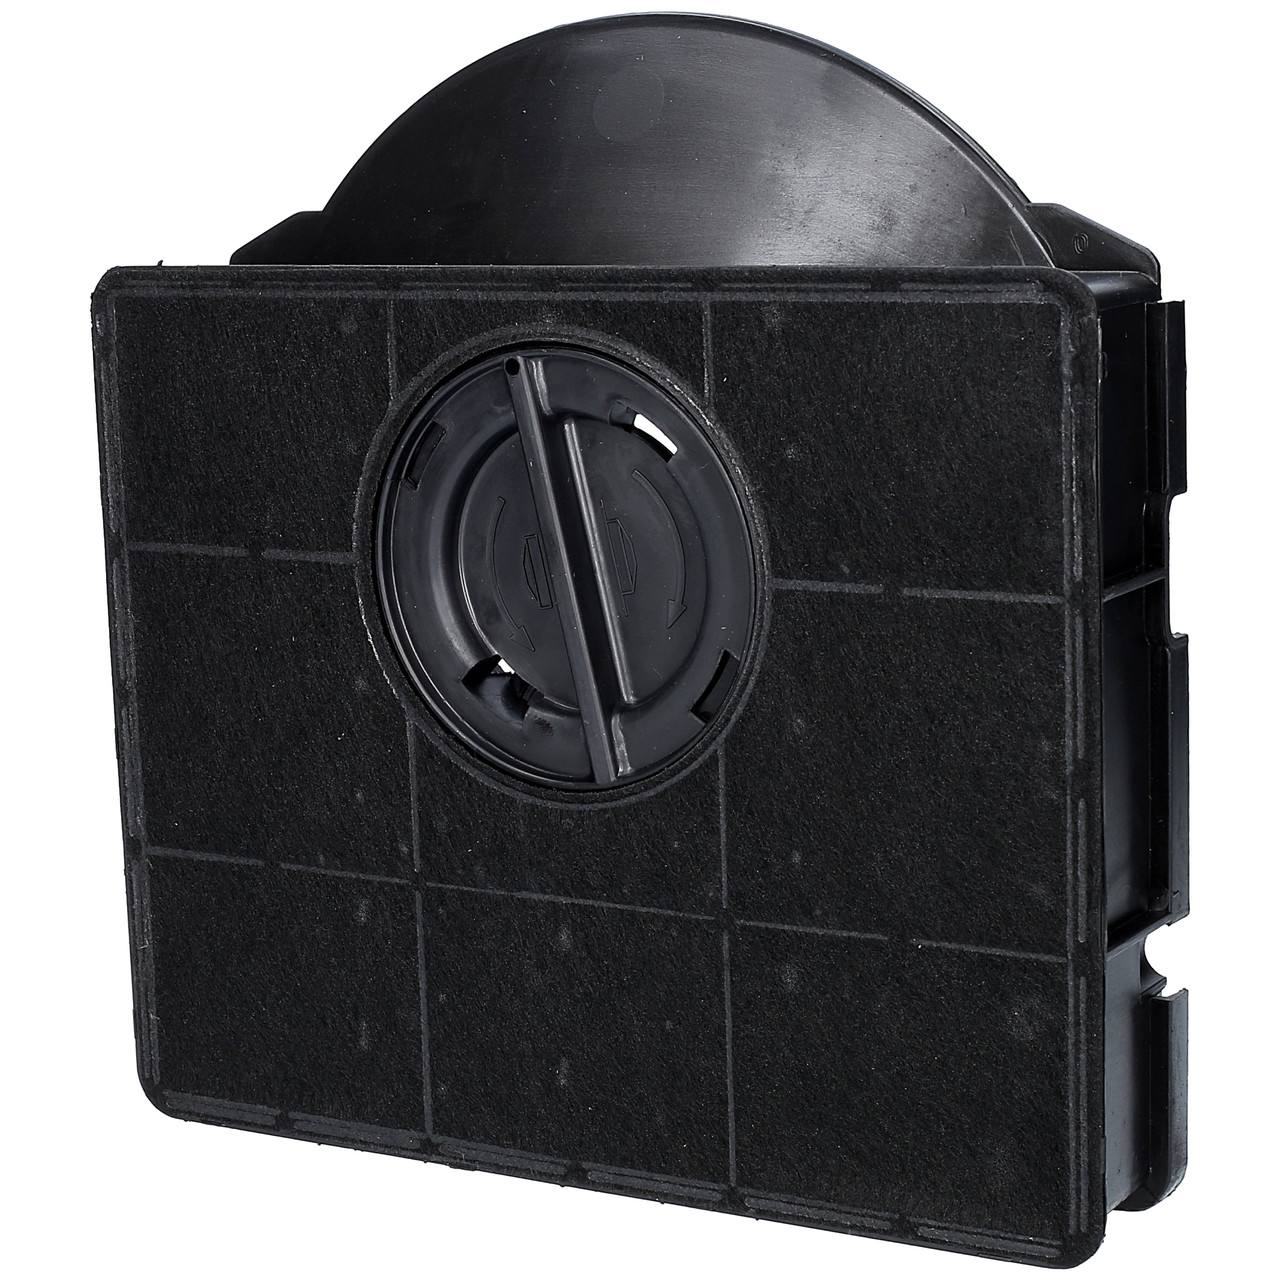 filter f r dunstabzugshaube aeg df4160ml kohle ebay. Black Bedroom Furniture Sets. Home Design Ideas